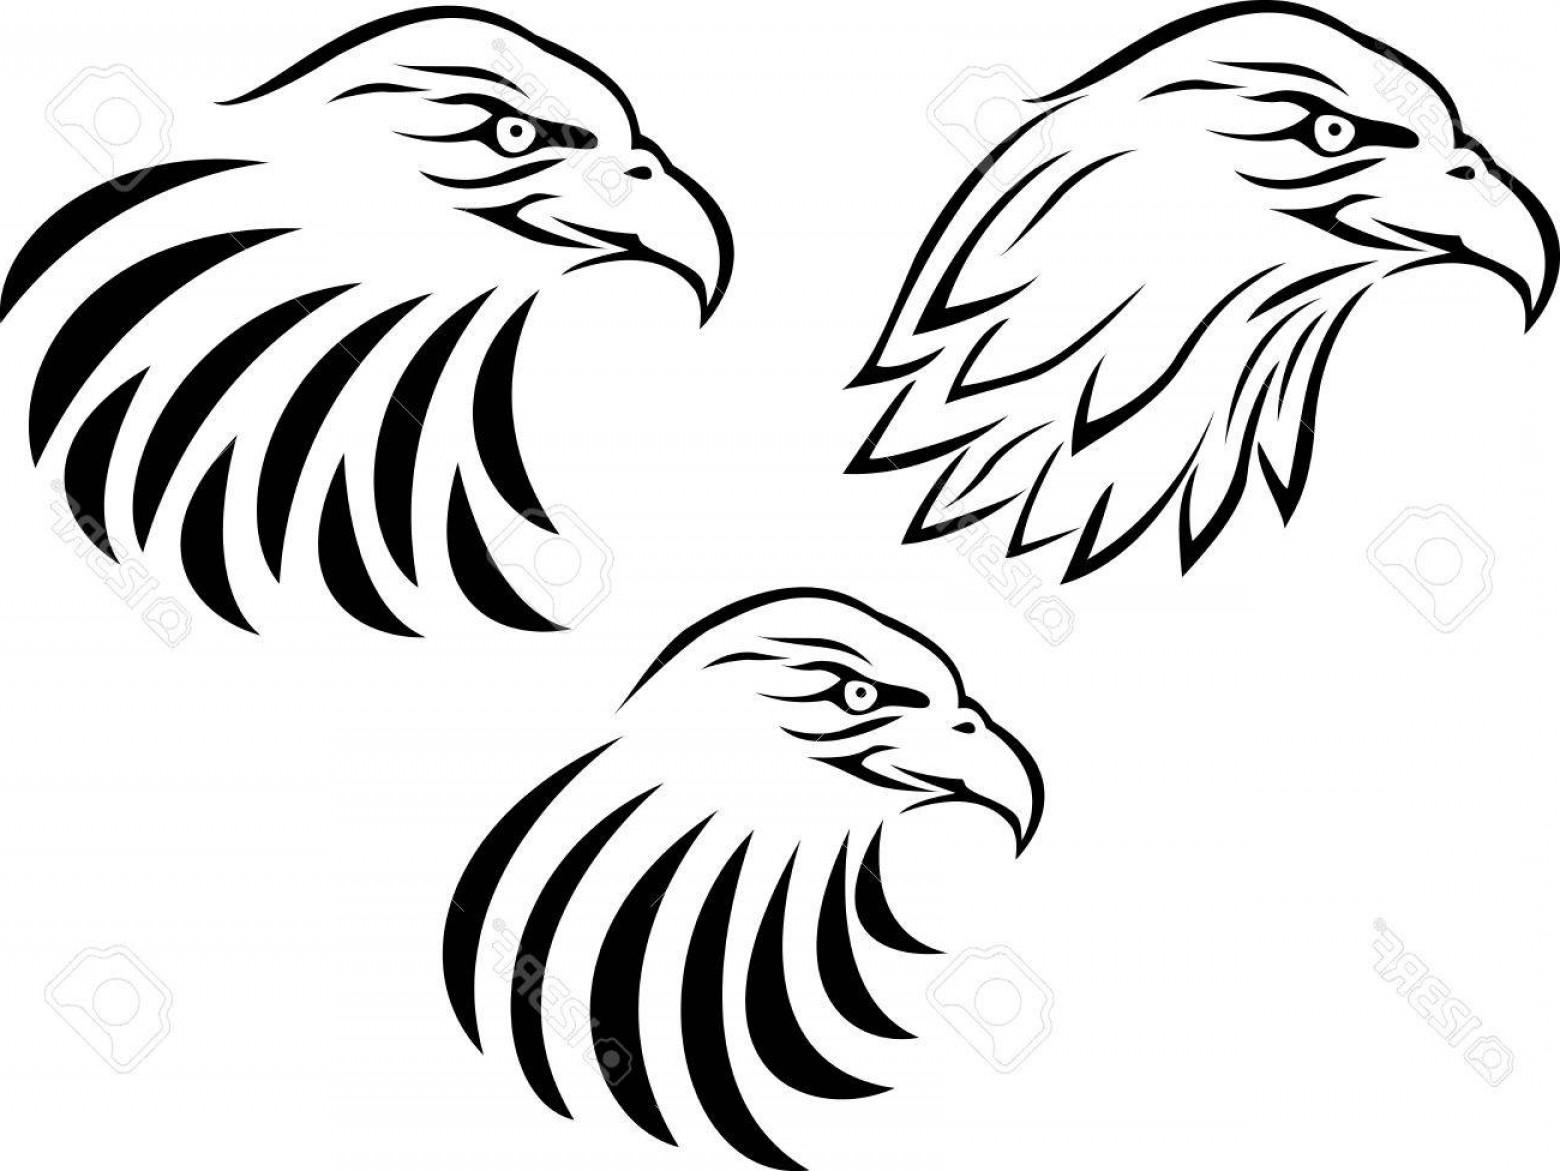 Eagle head clipart black and white svg black and white download Eagle Head Clipart Black And White Vector | SOIDERGI svg black and white download